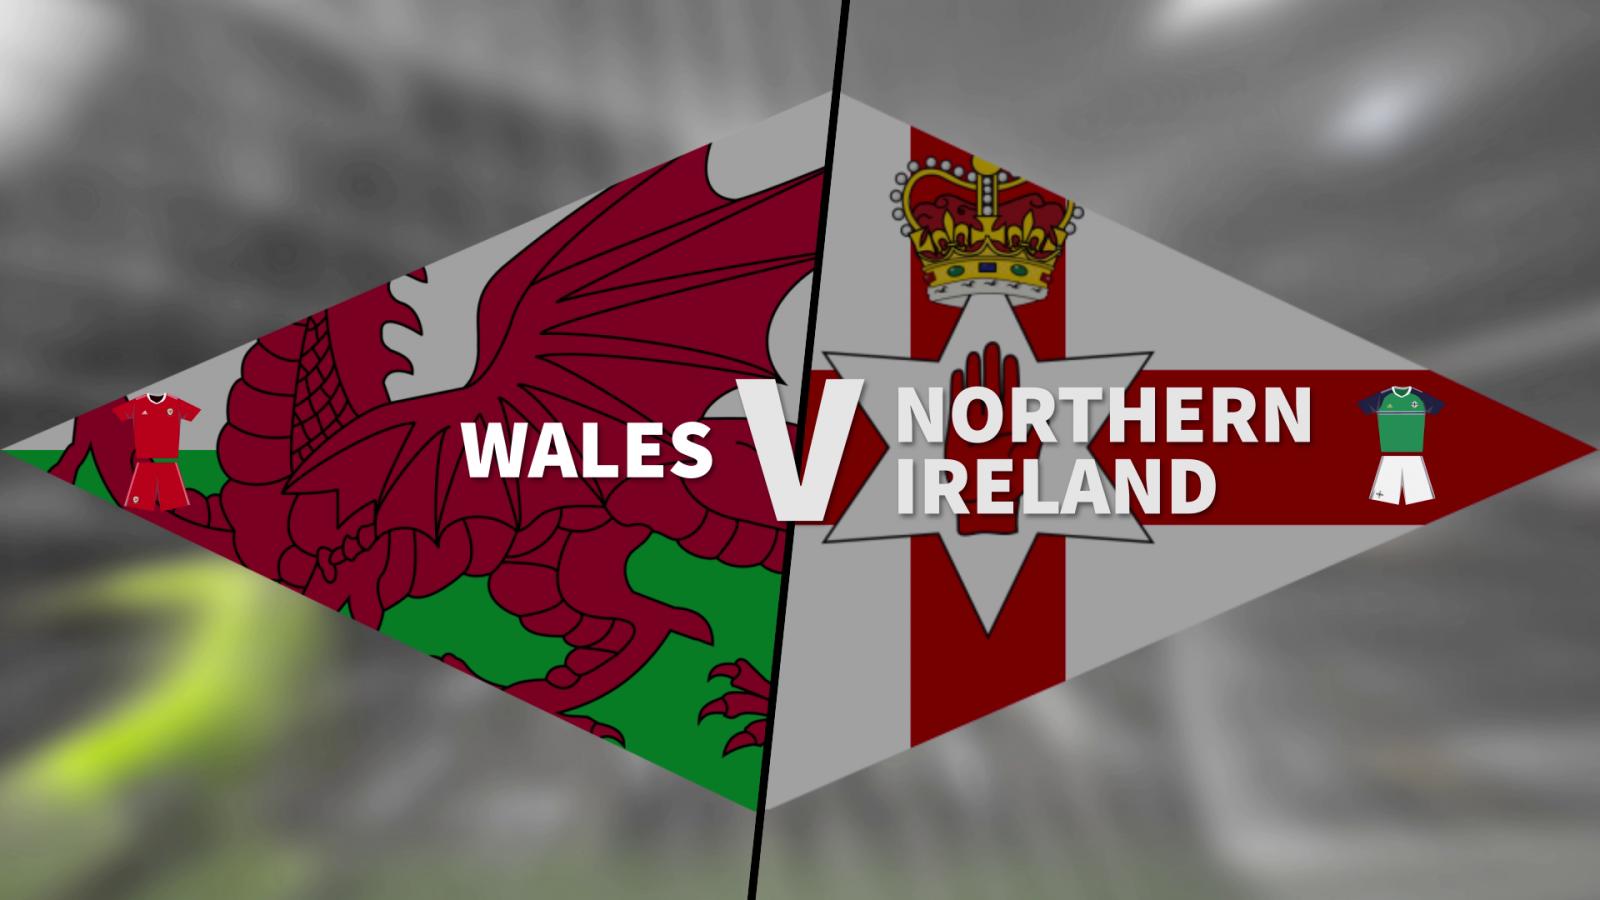 Wales vs Northern Ireland